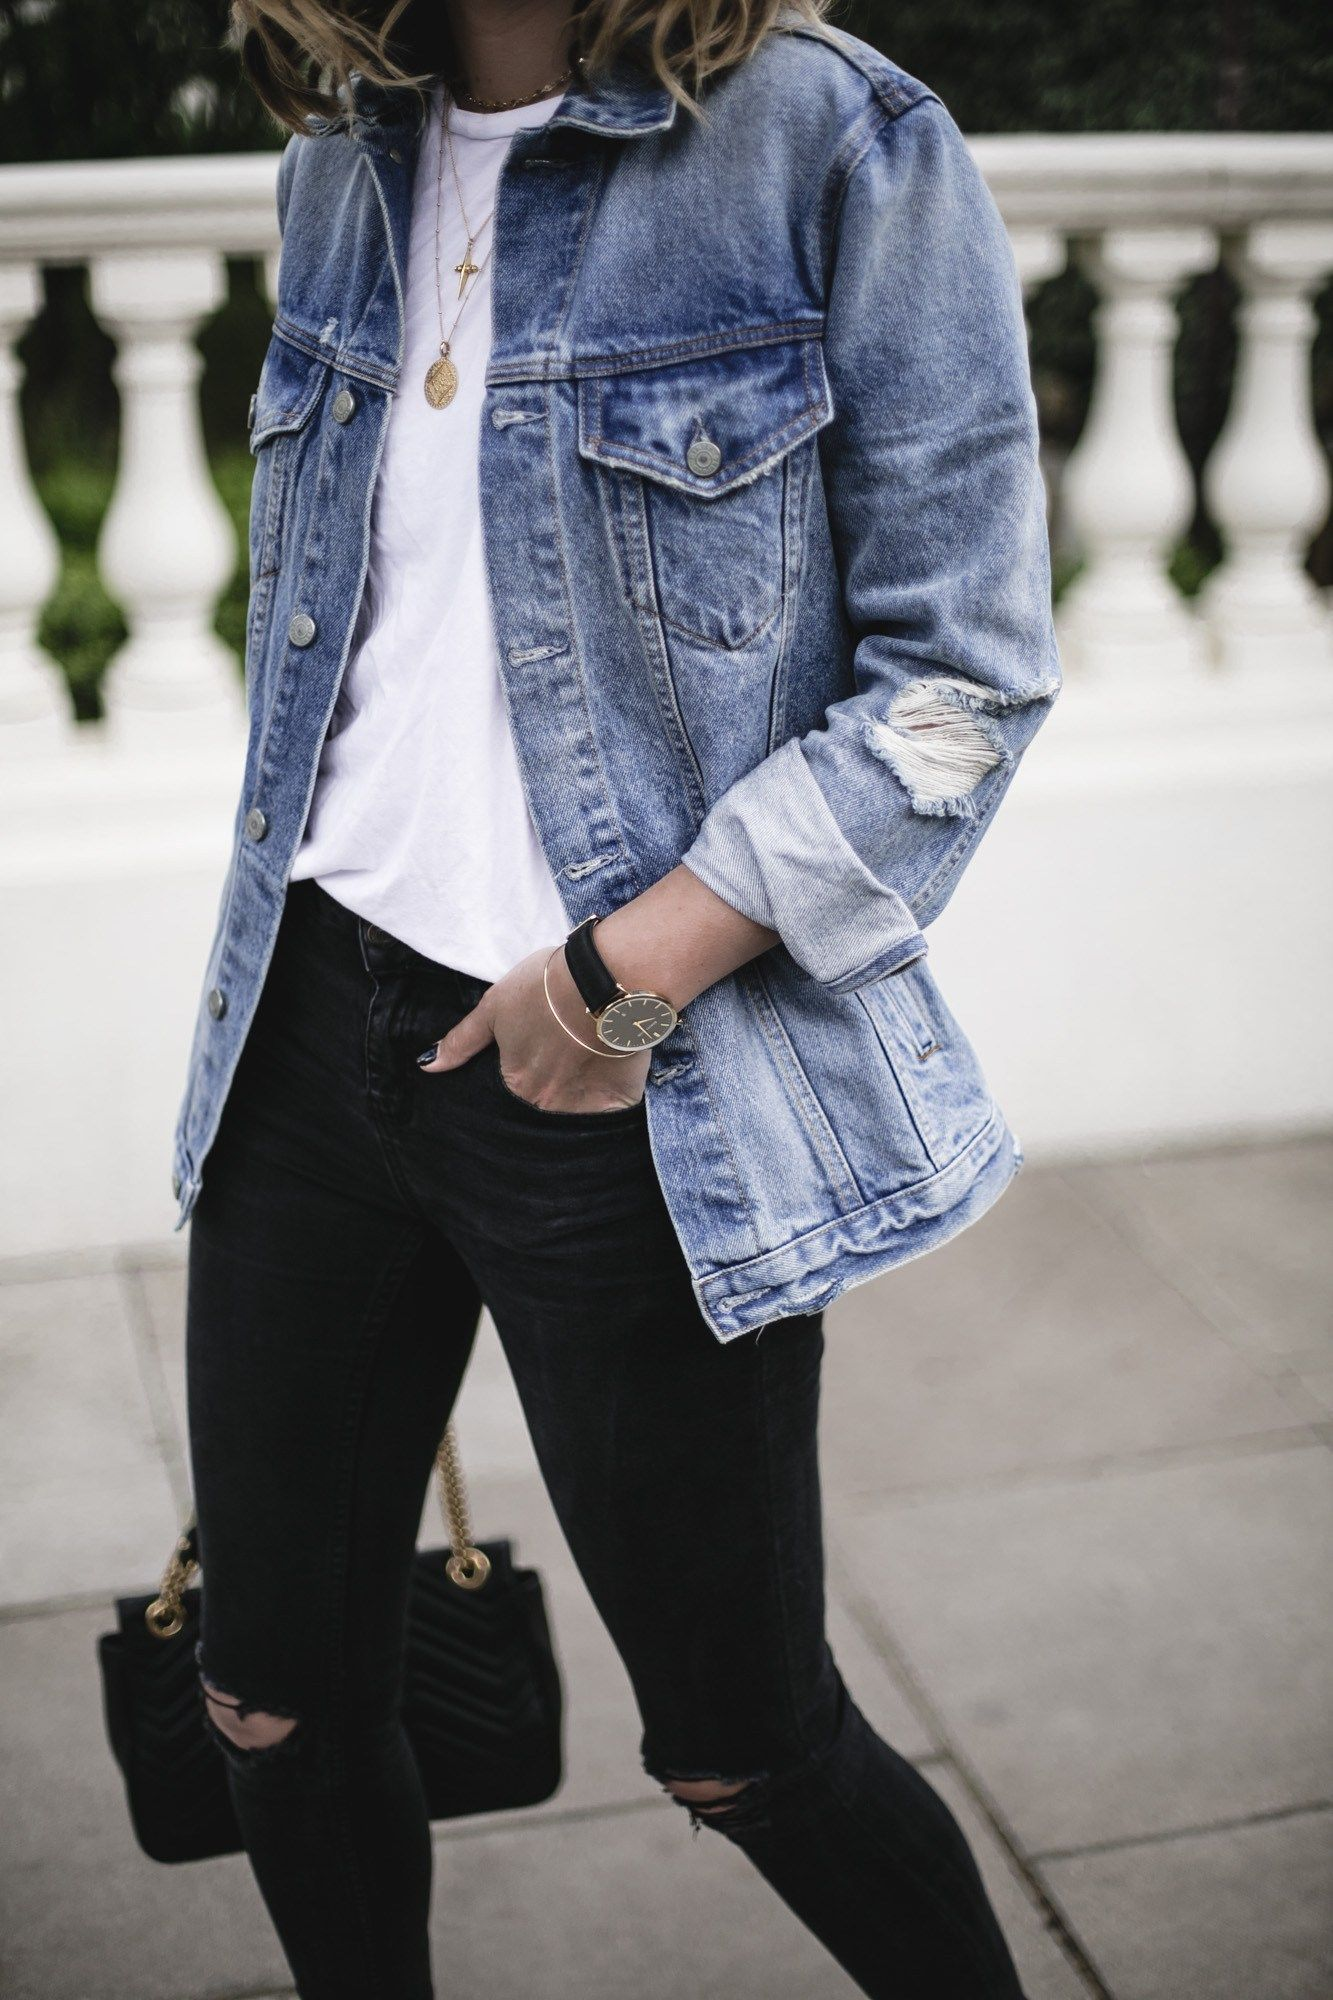 Emma Hill Wears Grlfrnd Oversized Denim Jacket White T Shirt Black Skinny Jeans Gold Jewell Blue Jean Jacket Outfits Denim Jacket Outfit Jean Jacket Outfits